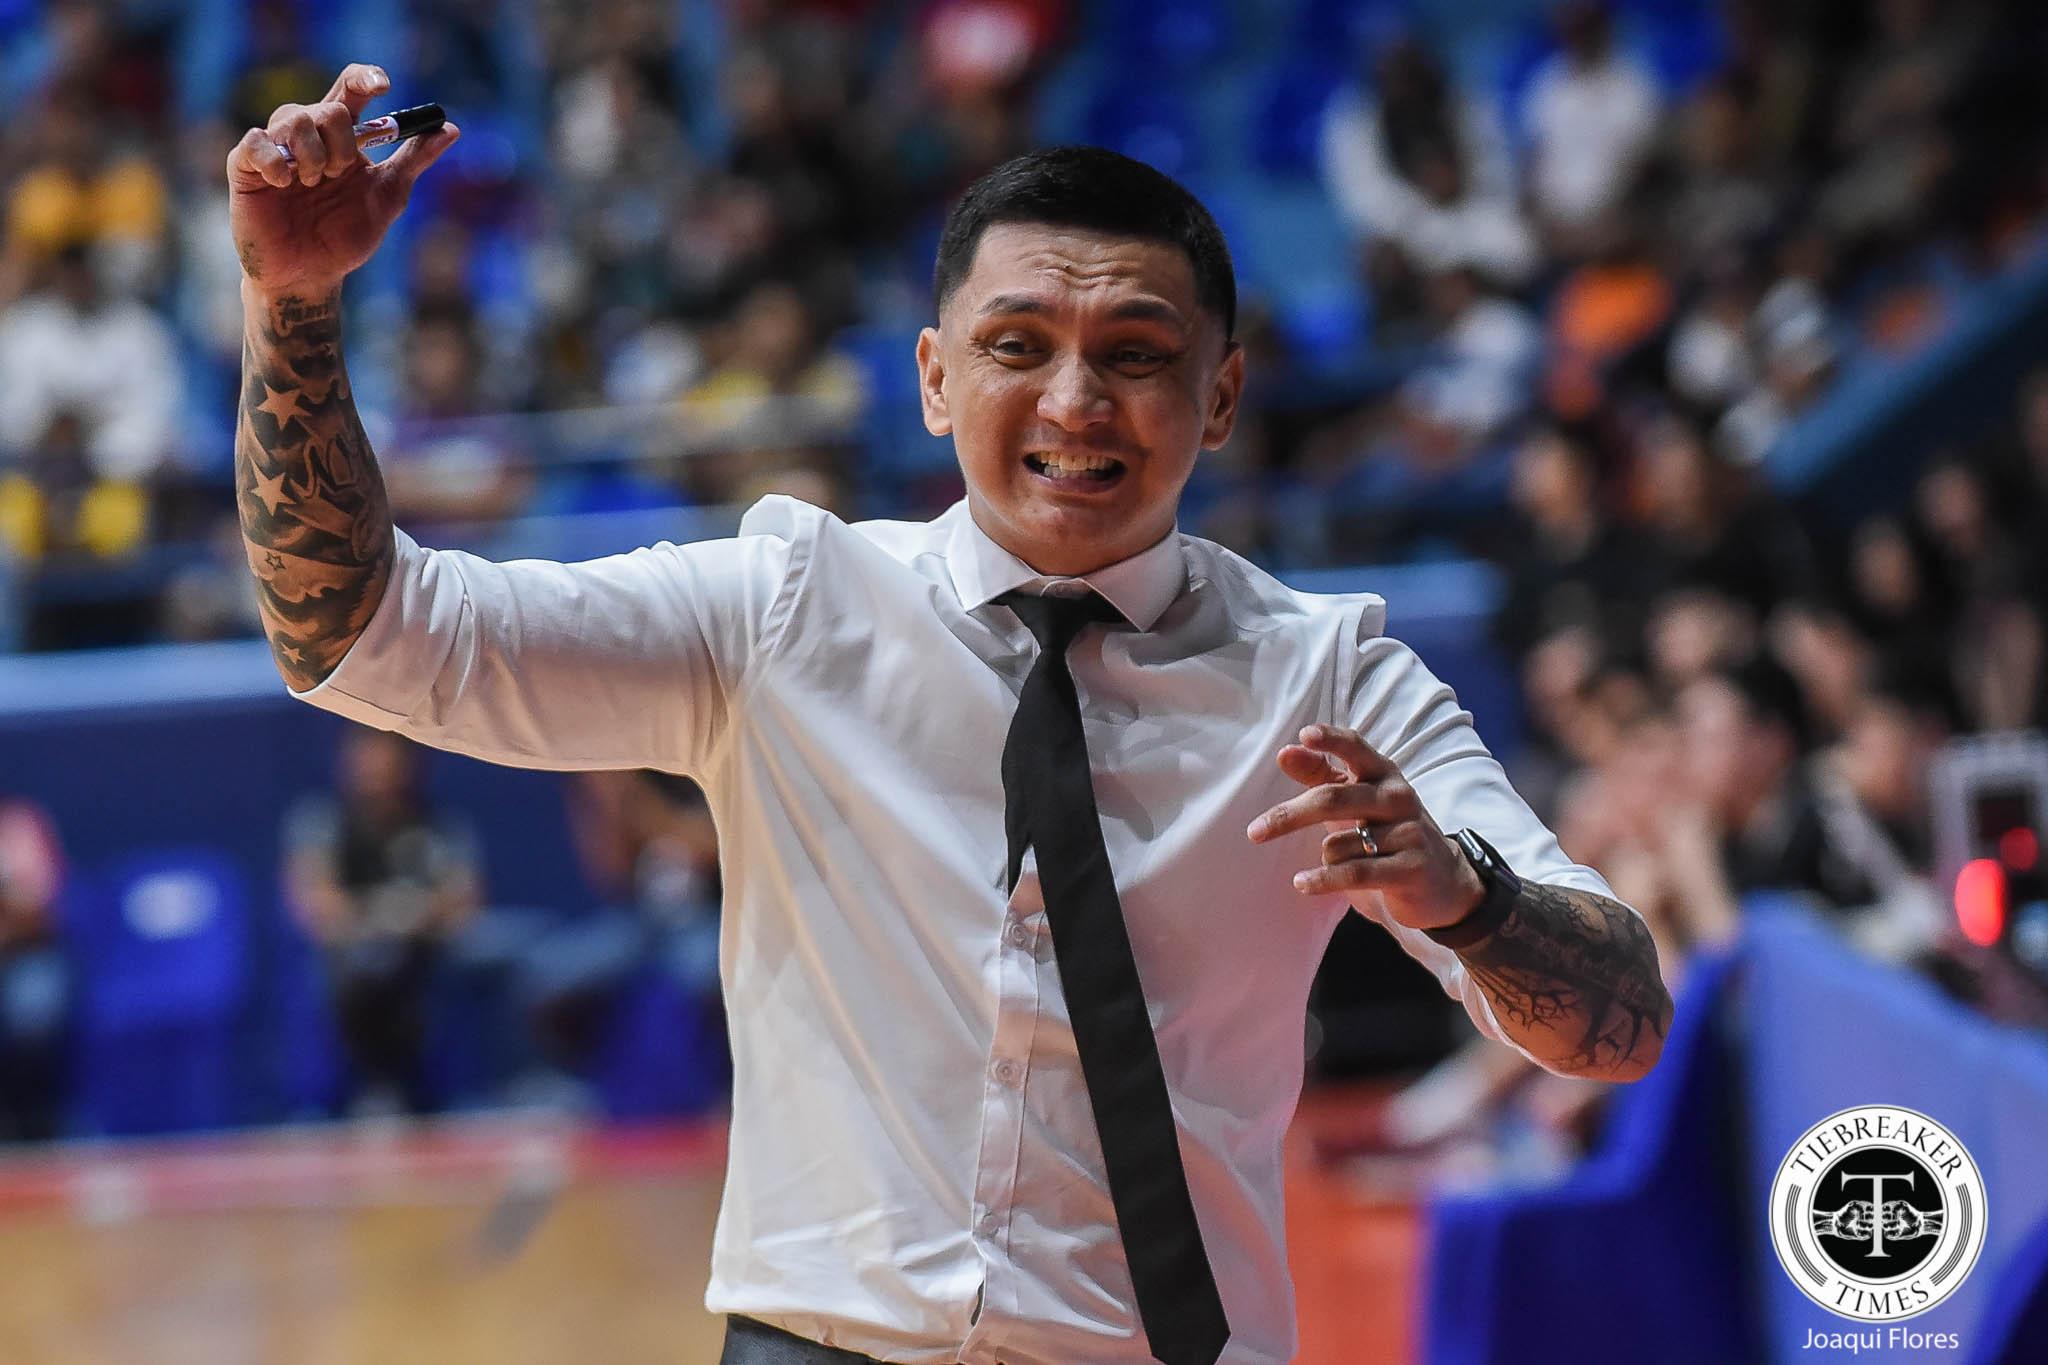 Tiebreaker Times At last, Jimmy Alapag makes San Miguel coaching debut Basketball News PBA  San Miguel Beermen PBA Season 44 Jimmy Alapag 2019 PBA Philippine Cup